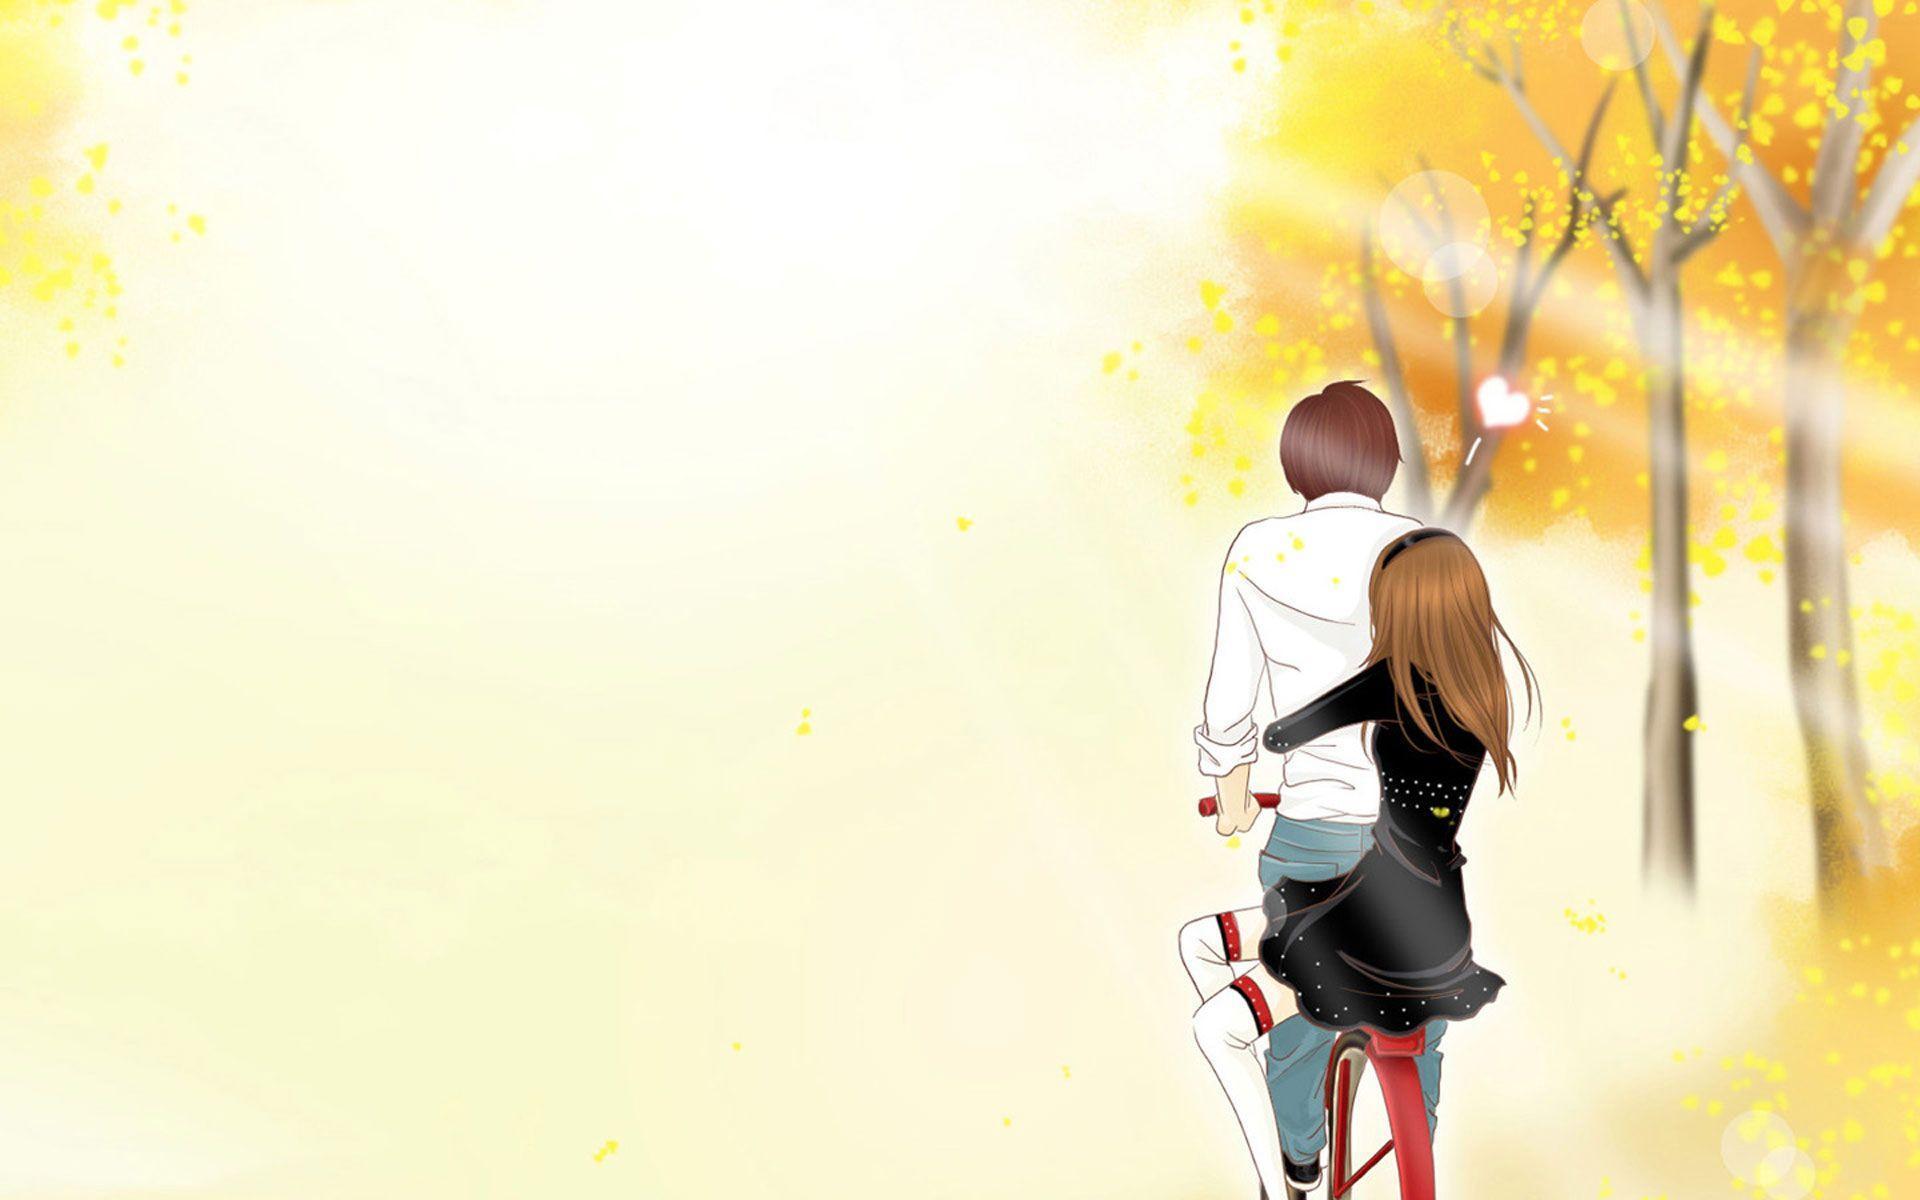 romantic anime wallpaper - photo #14